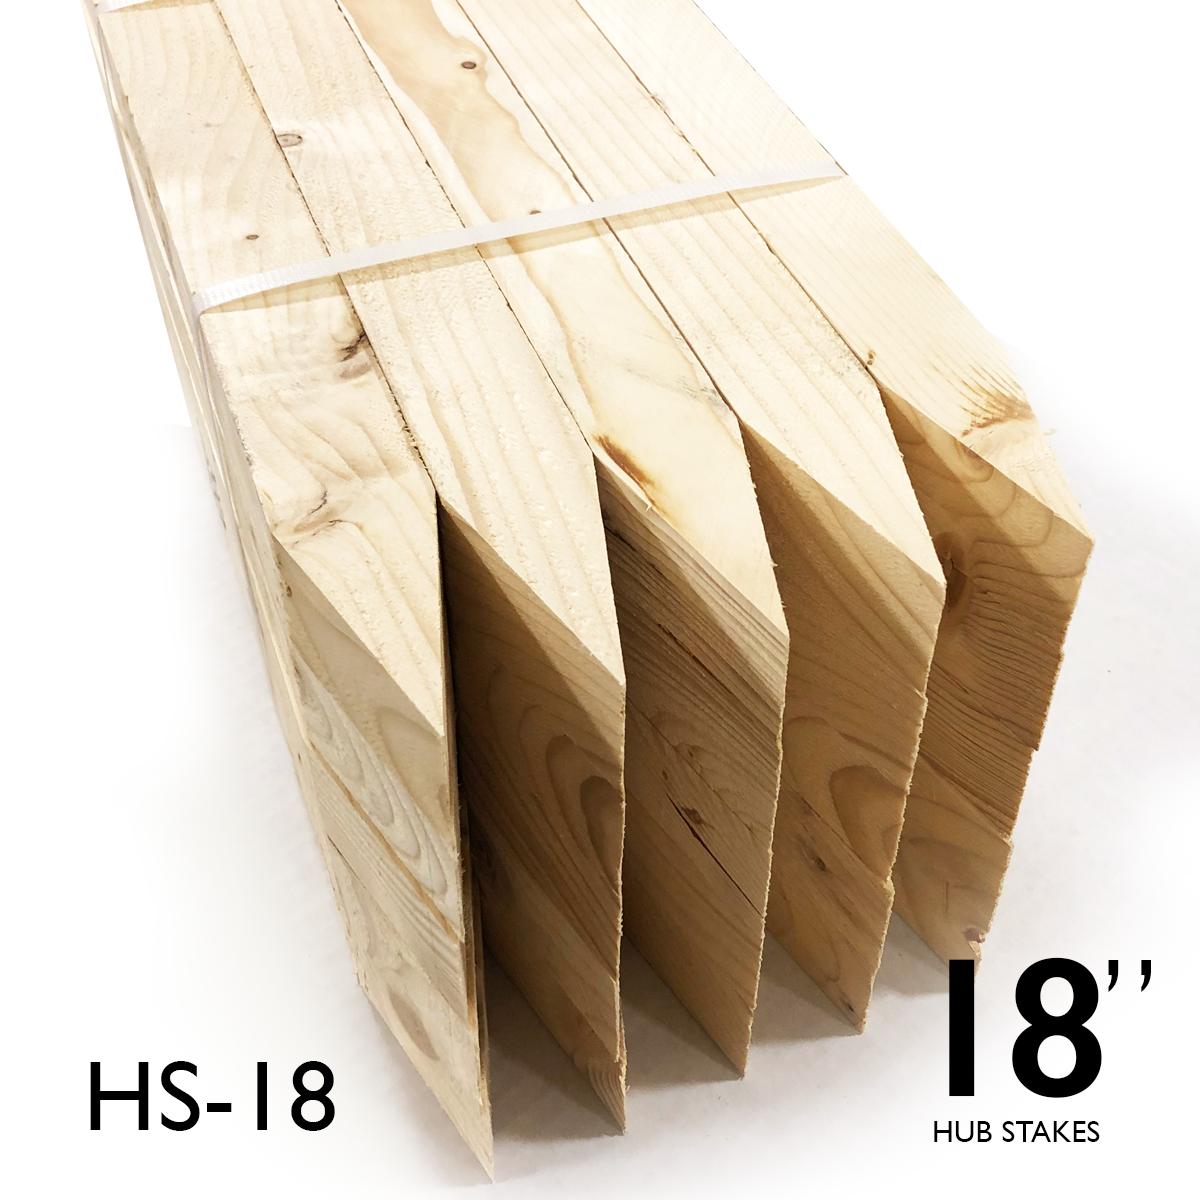 "Hub Stakes 2 X 2 X 18"" FULL Pallet"